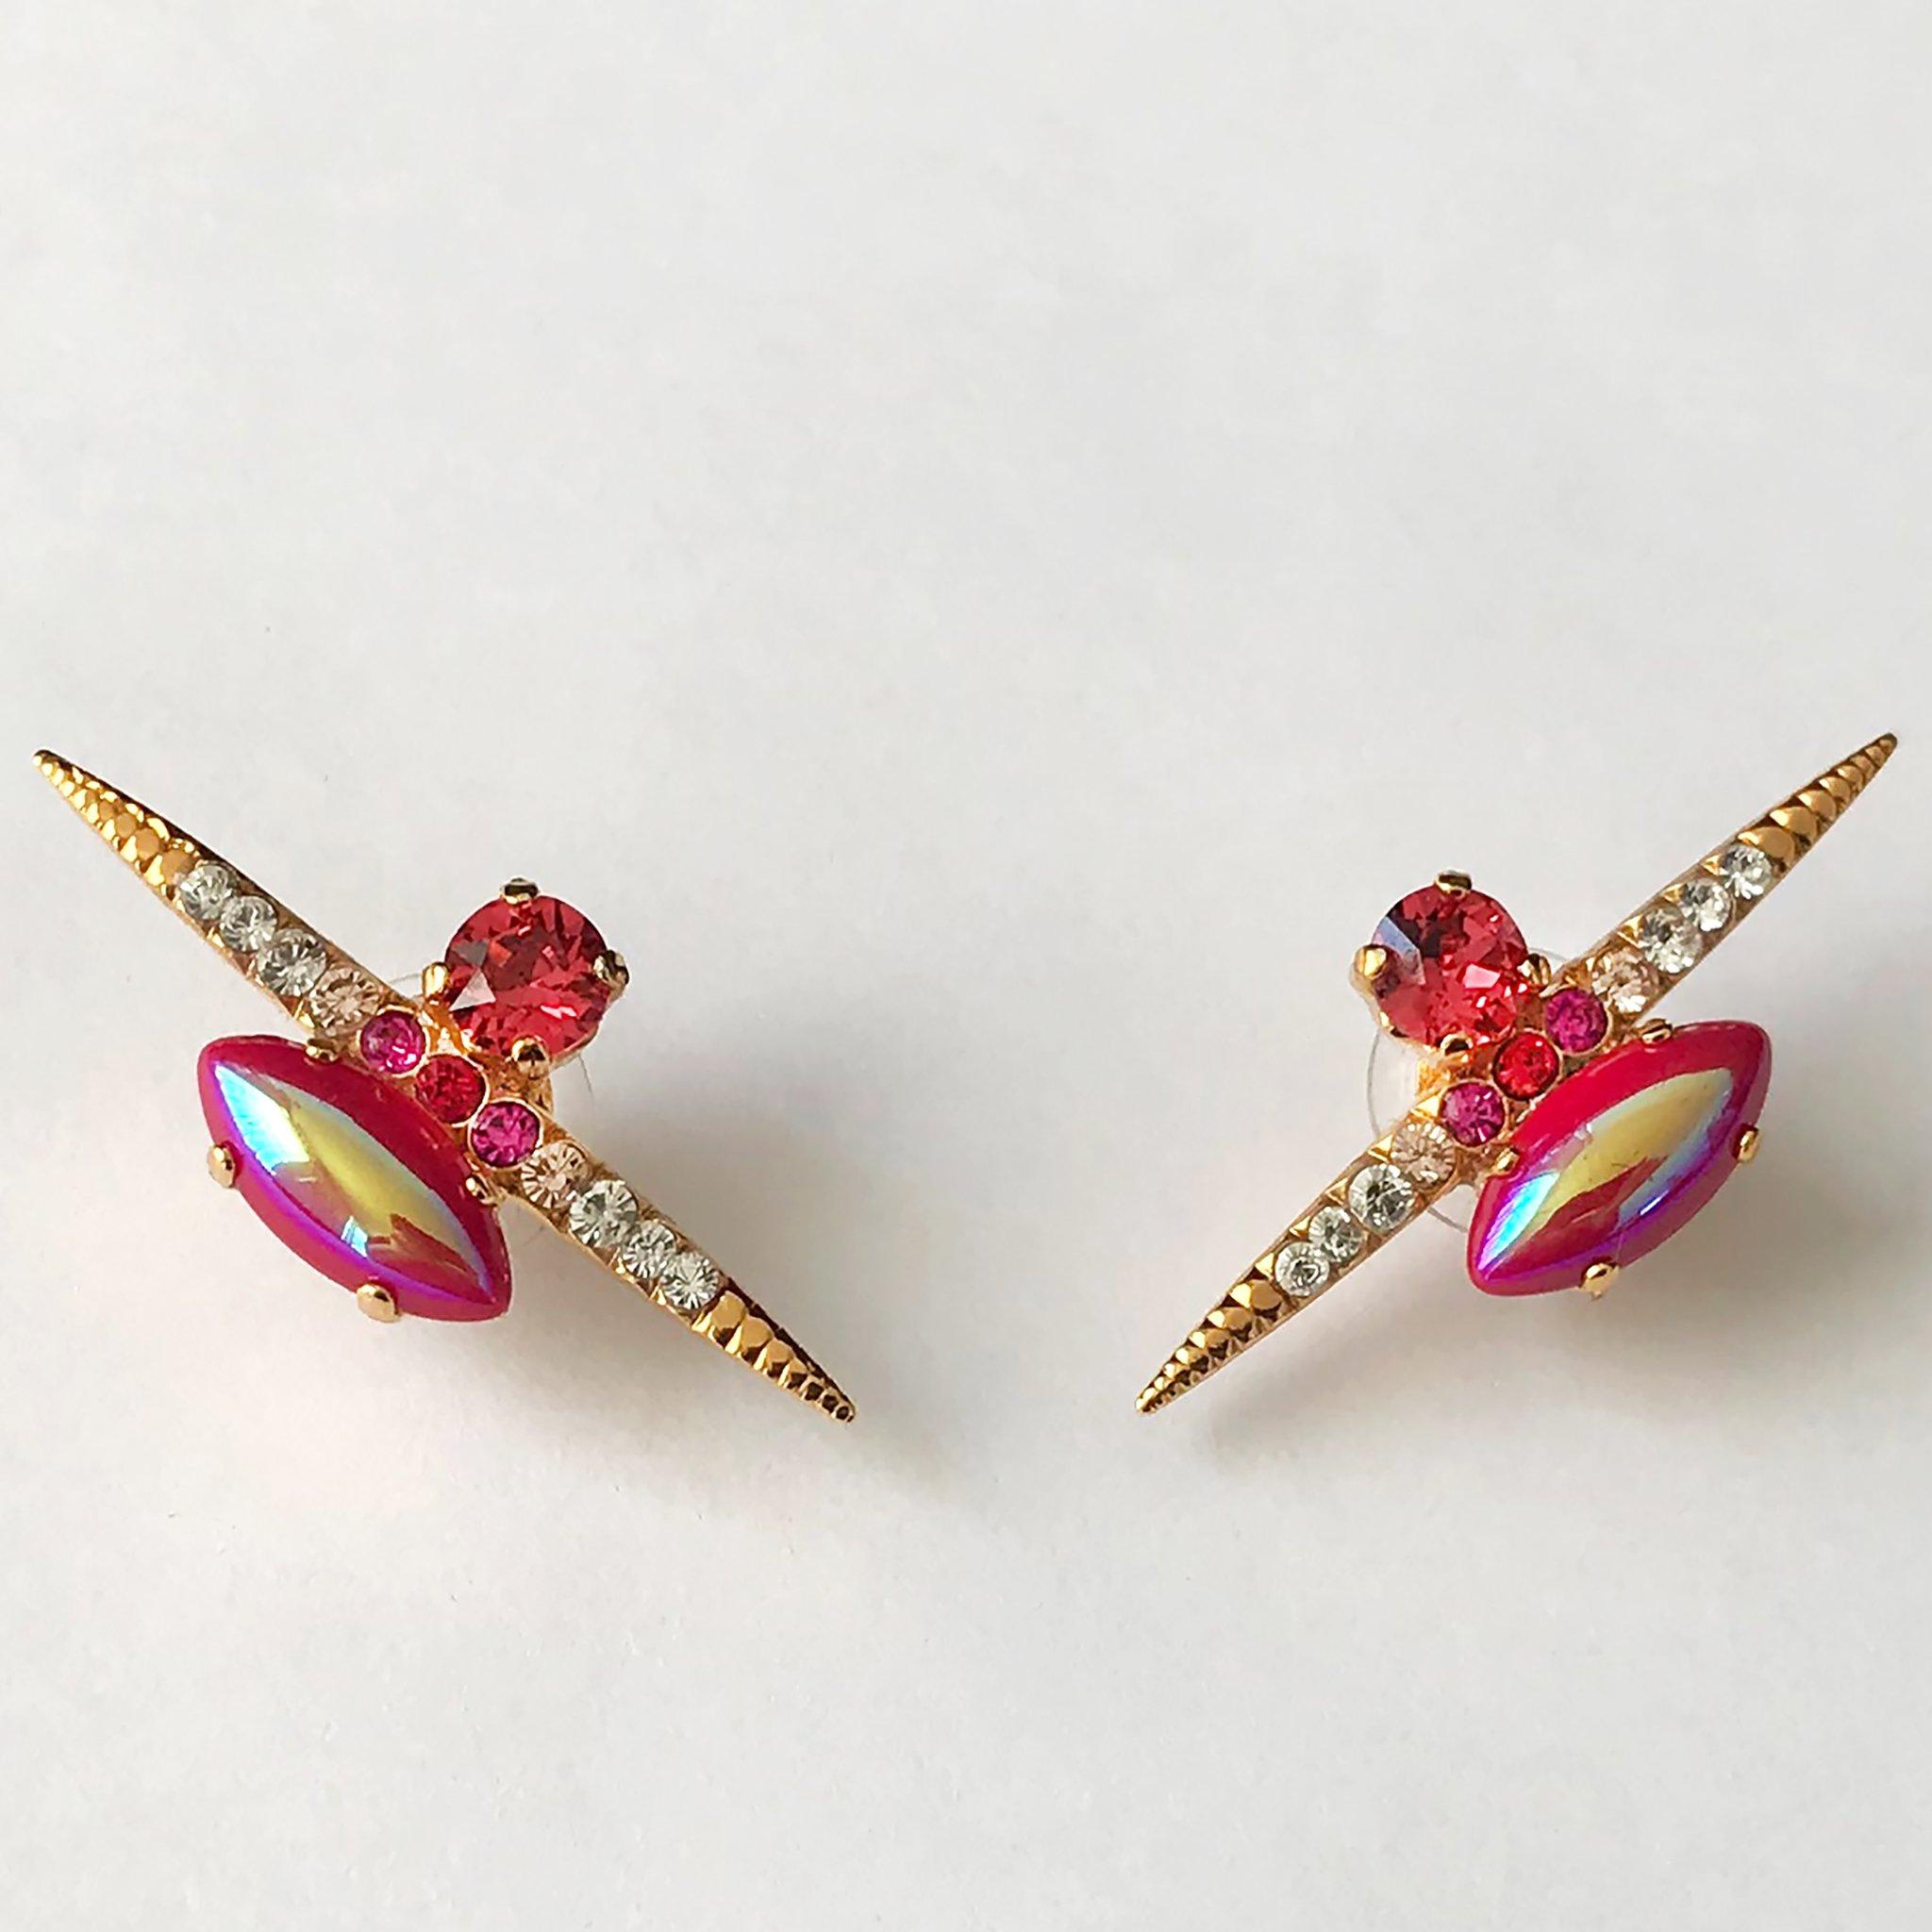 Heiter-jewellery-spike-stone-stud-iridescent-red-gold